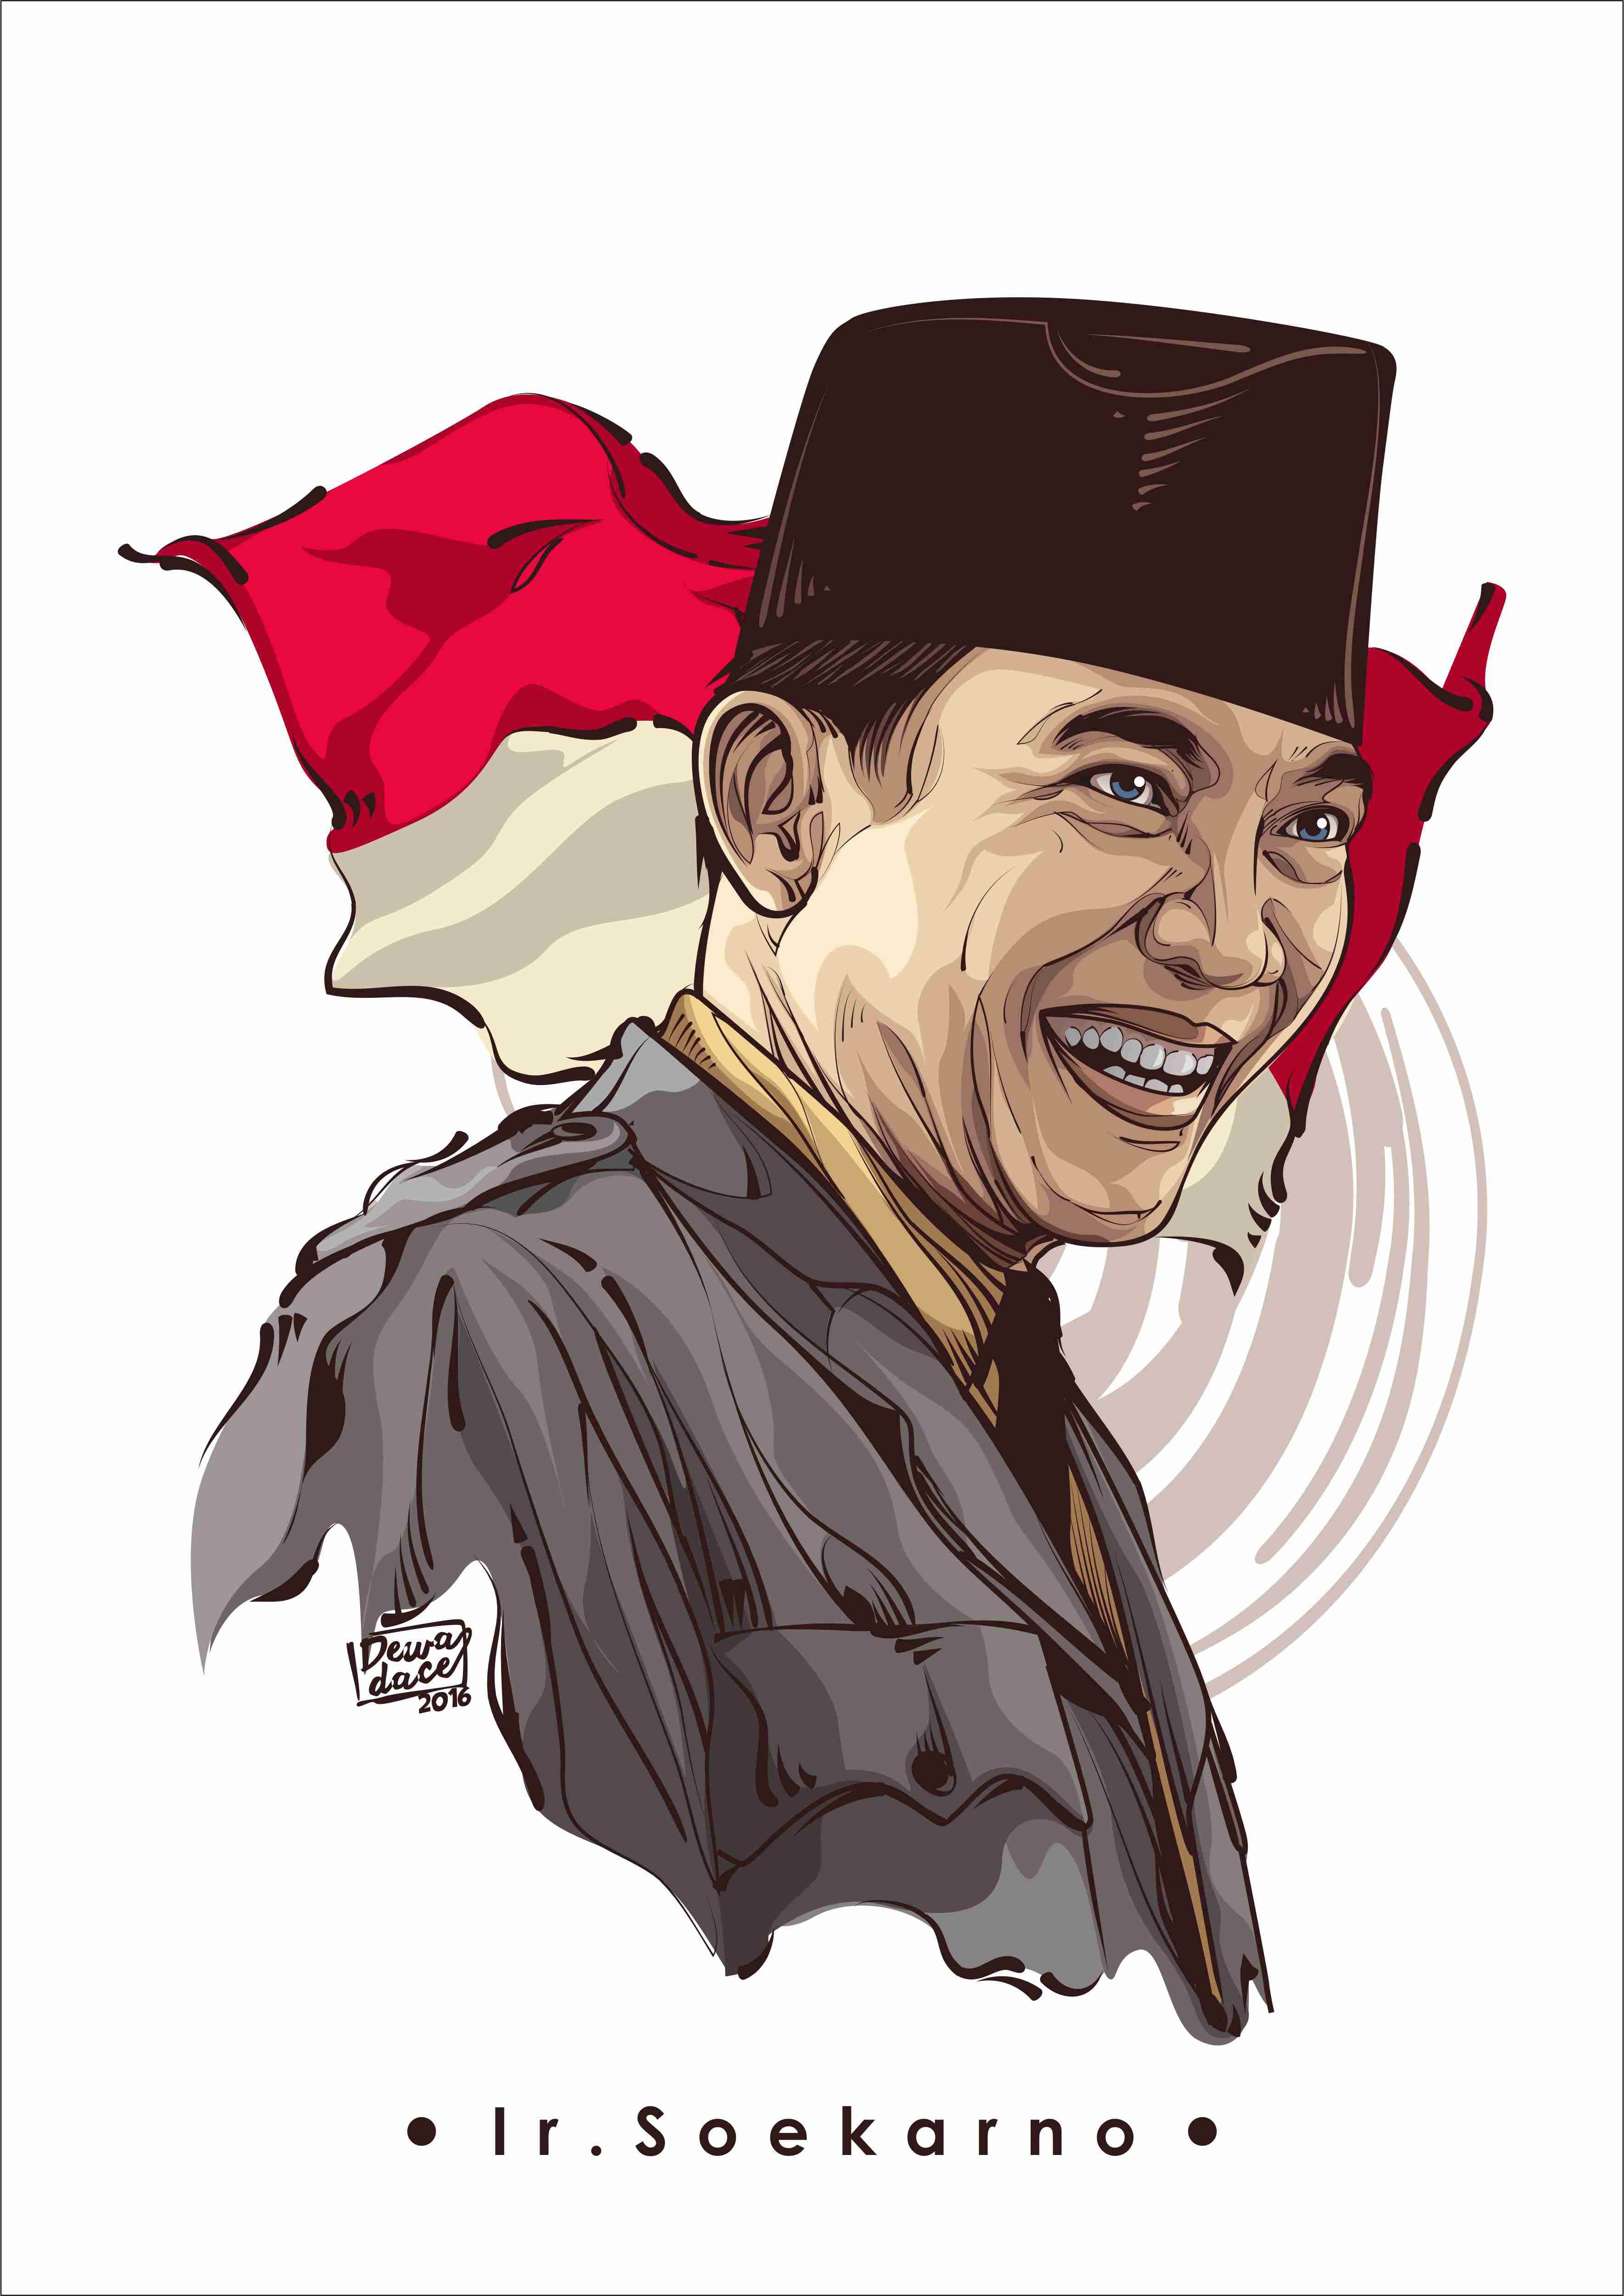 Gambar Pahlawan Ir Soekarno